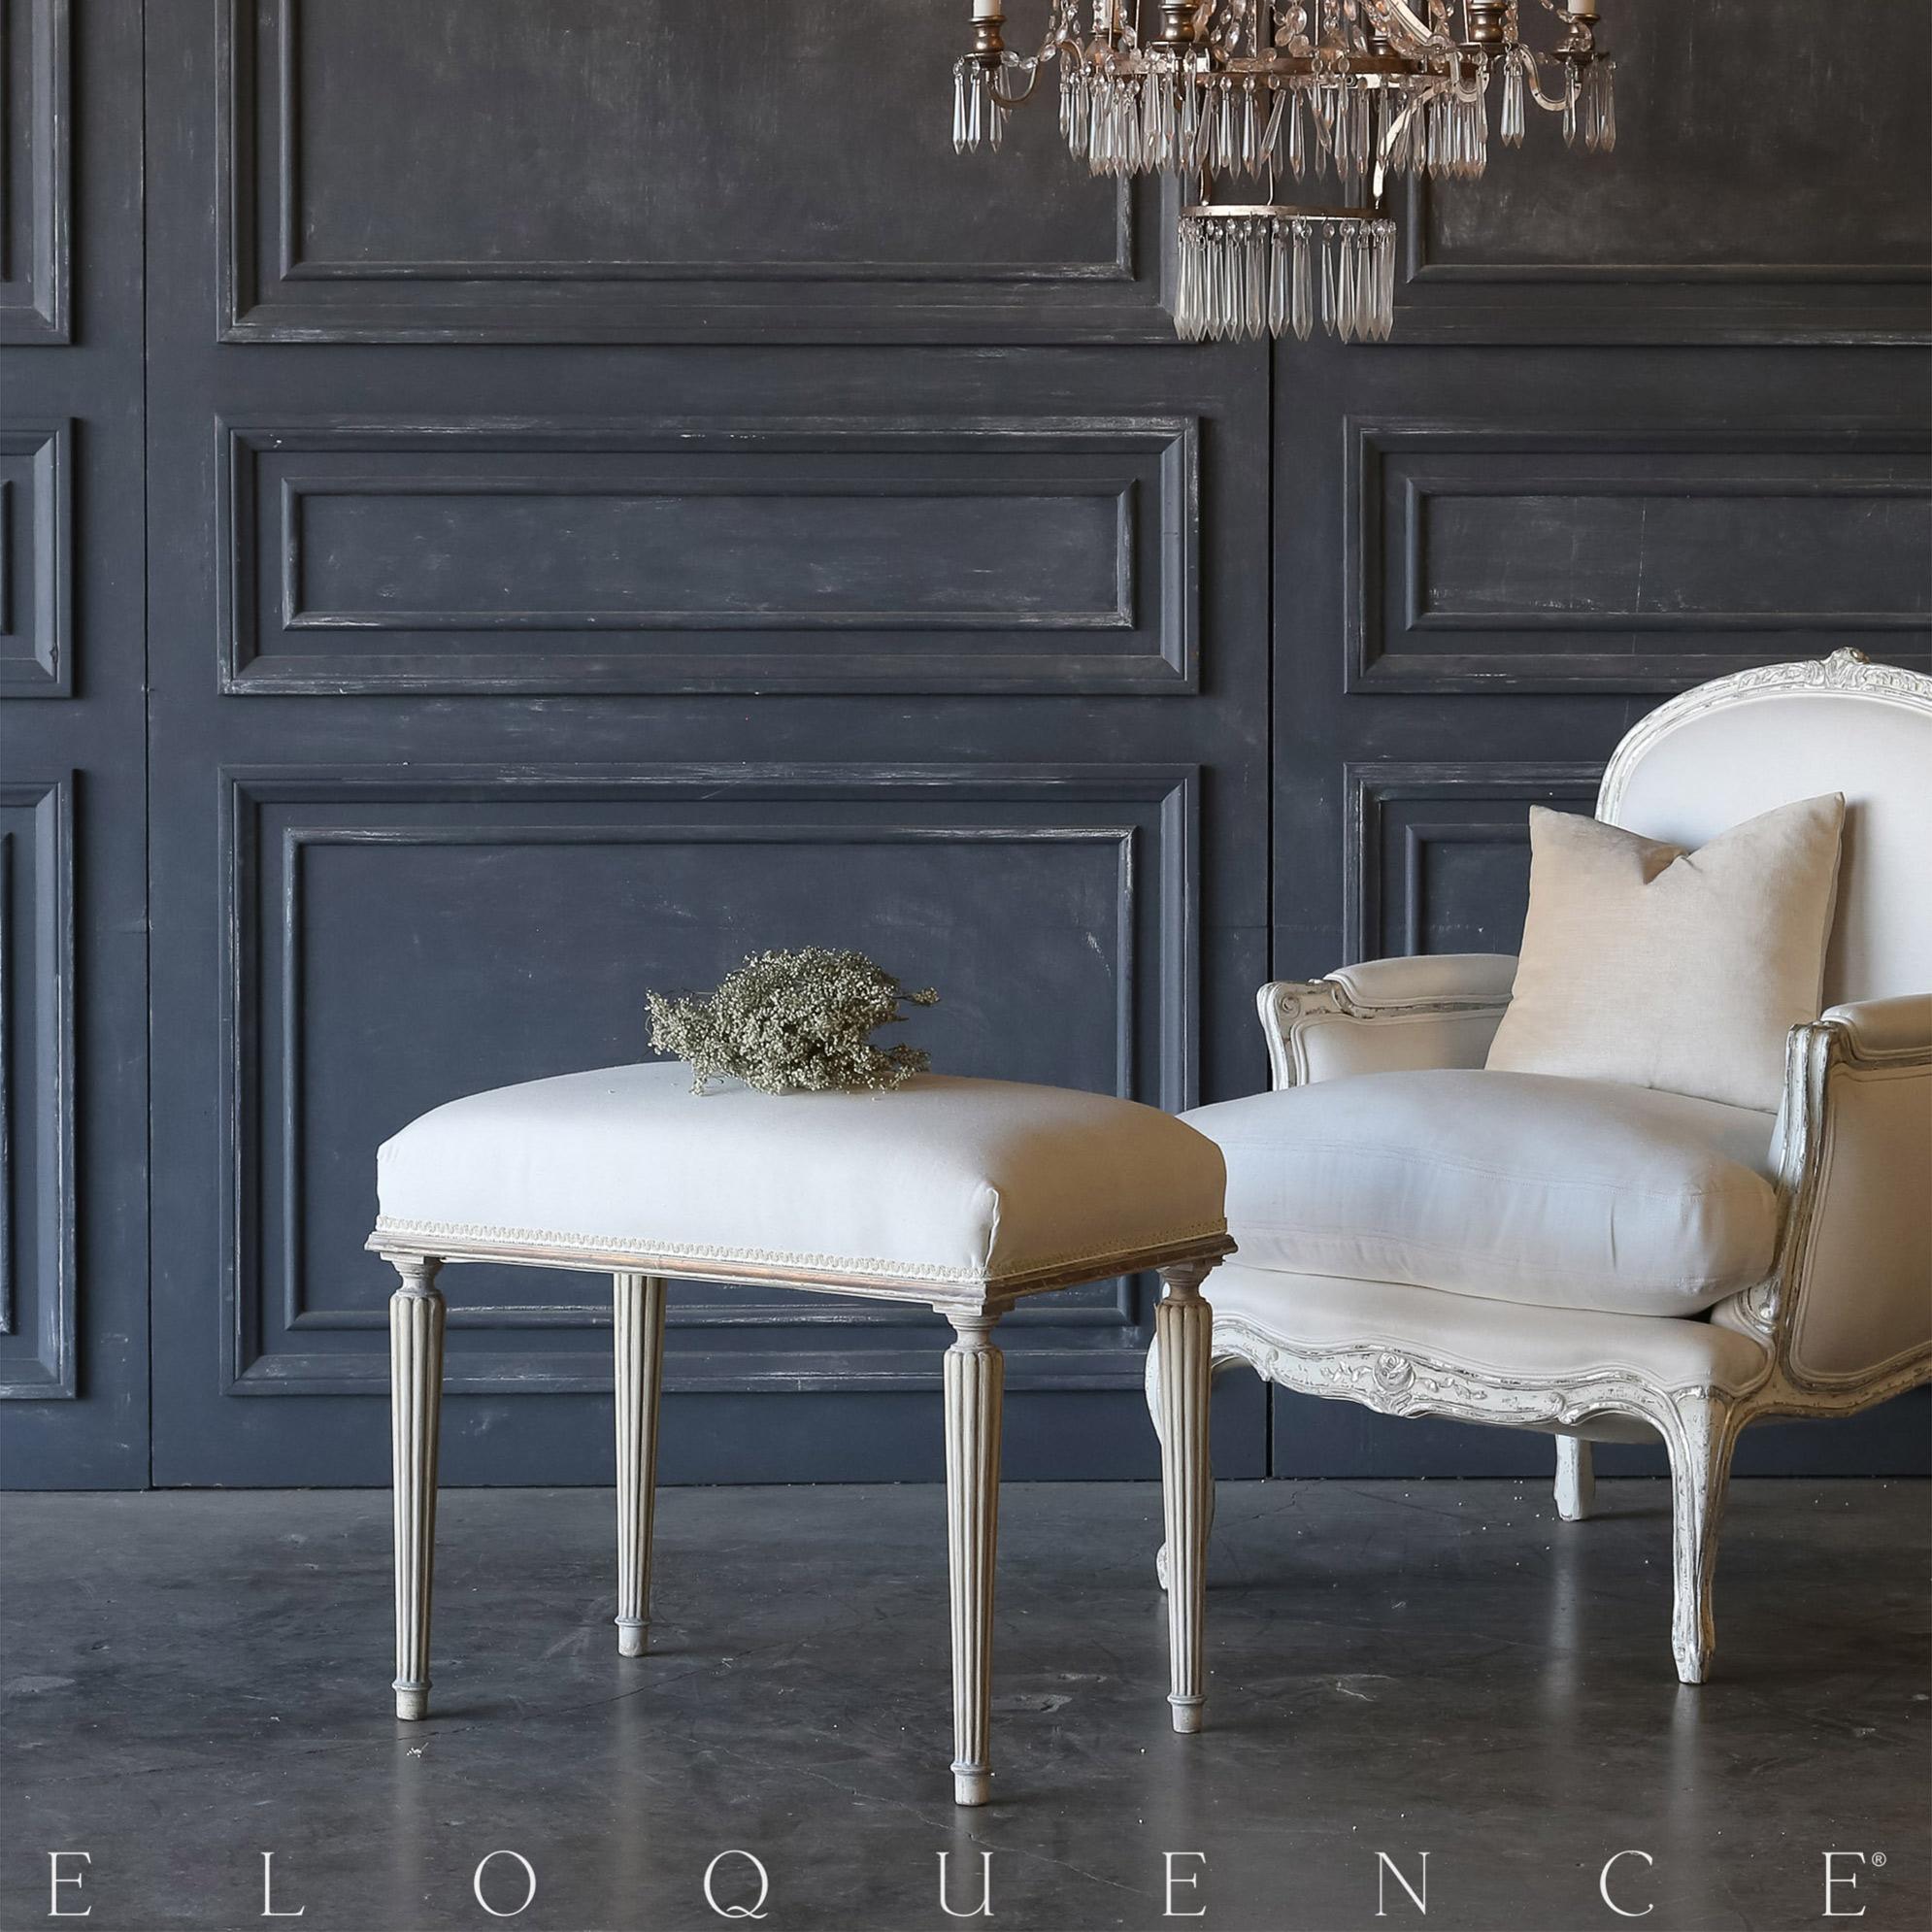 Eloquence® Vintage Antique White Louis Bench: 1940